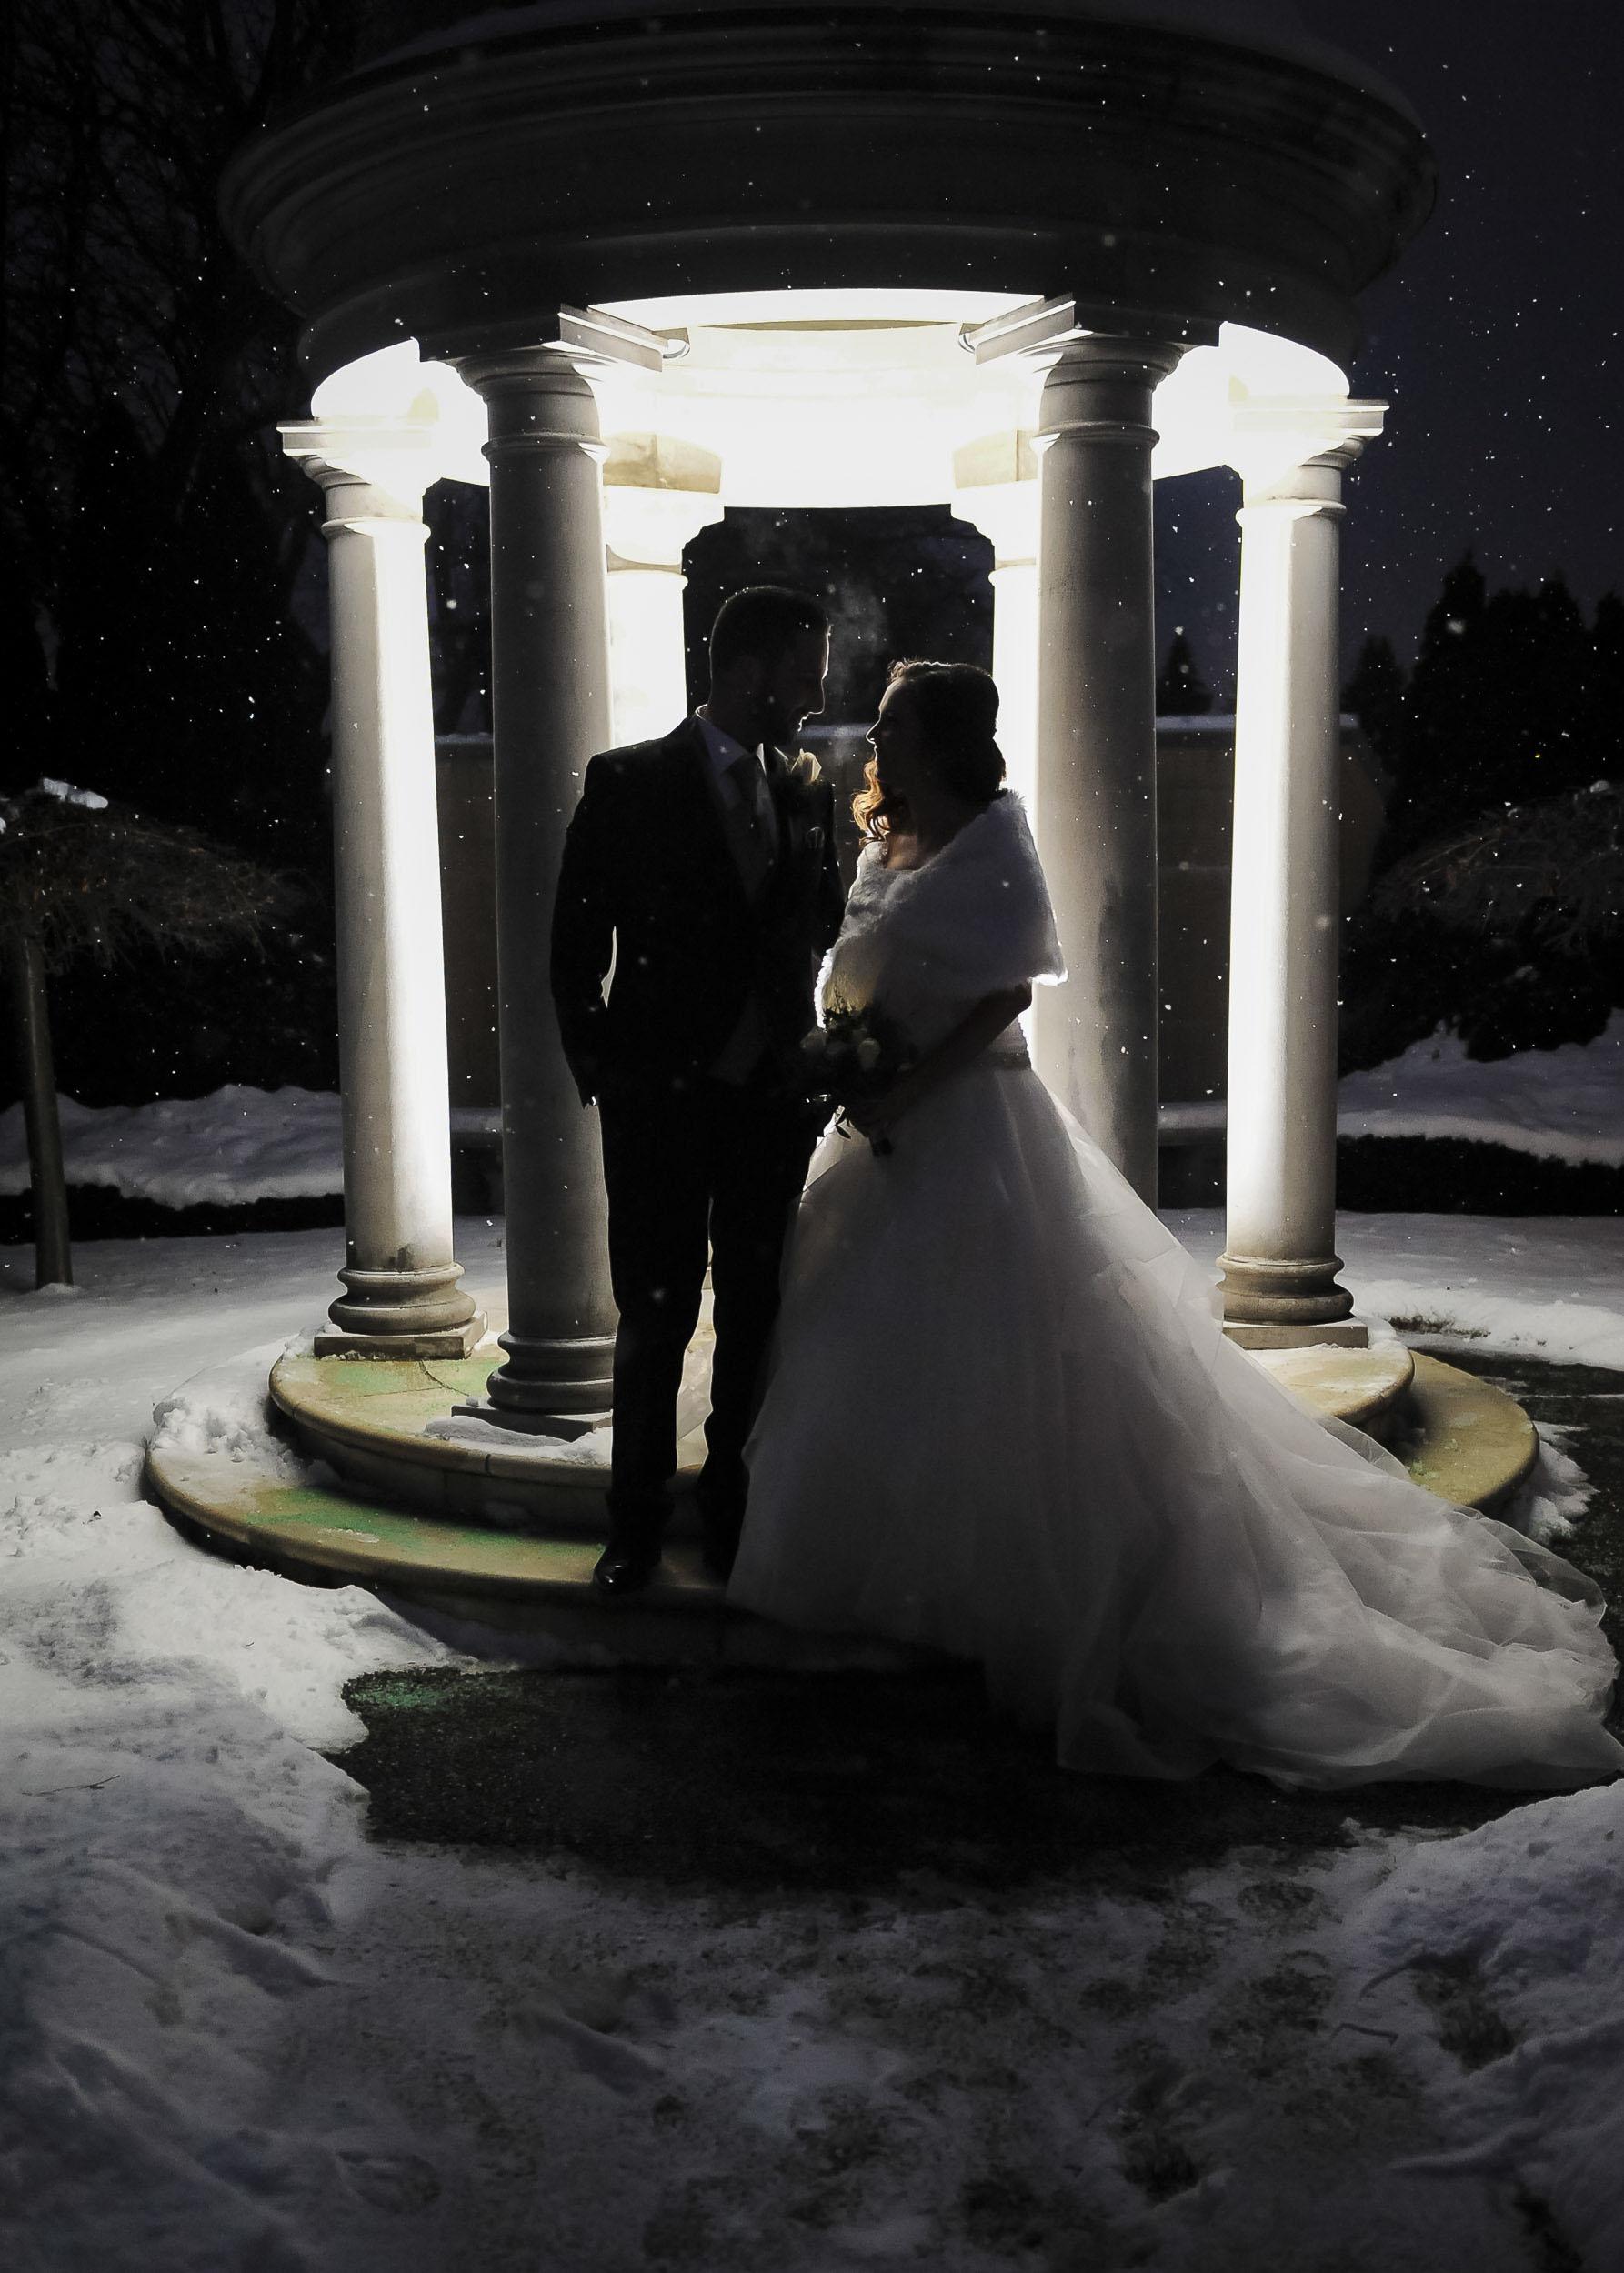 creative-wedding-photography-albany-ny | jeffrey-house-photography